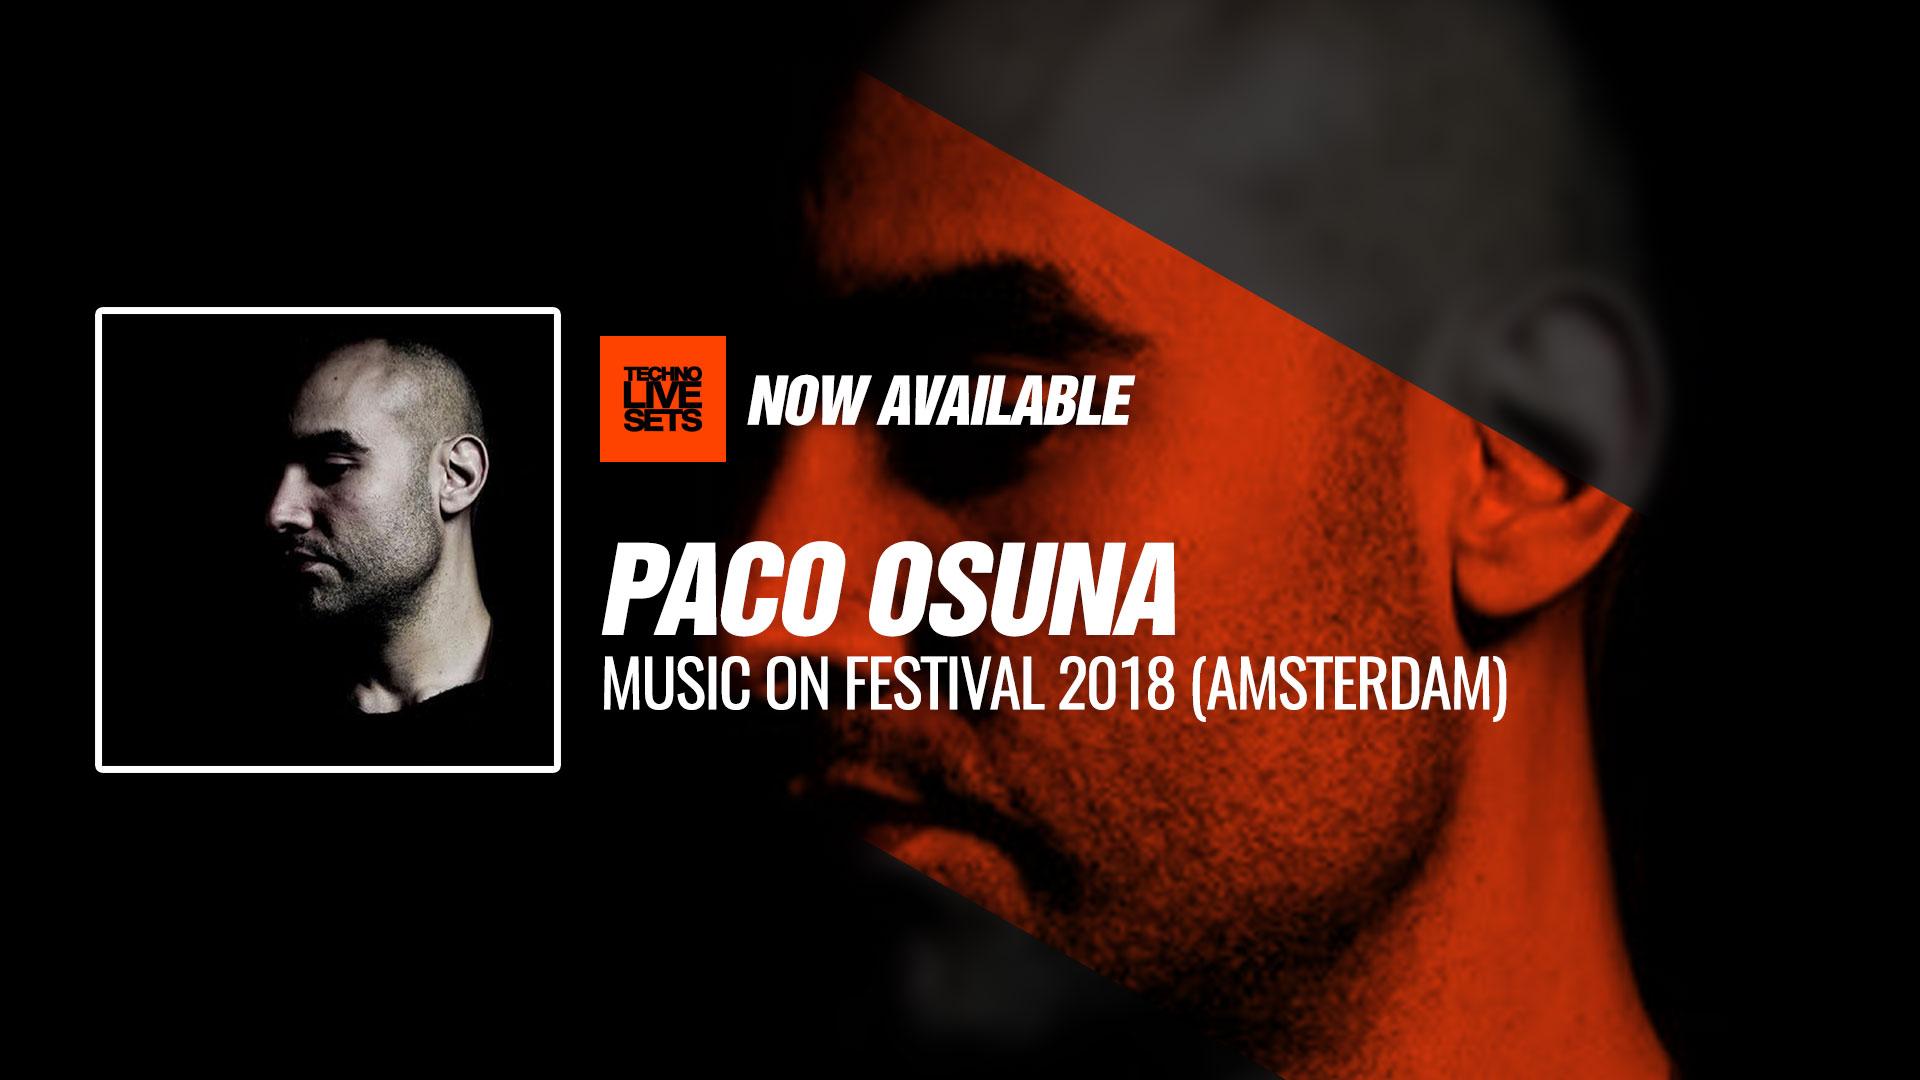 Paco Osuna 2018 Music On Festival 2018 (Amsterdam) 05-05-2018